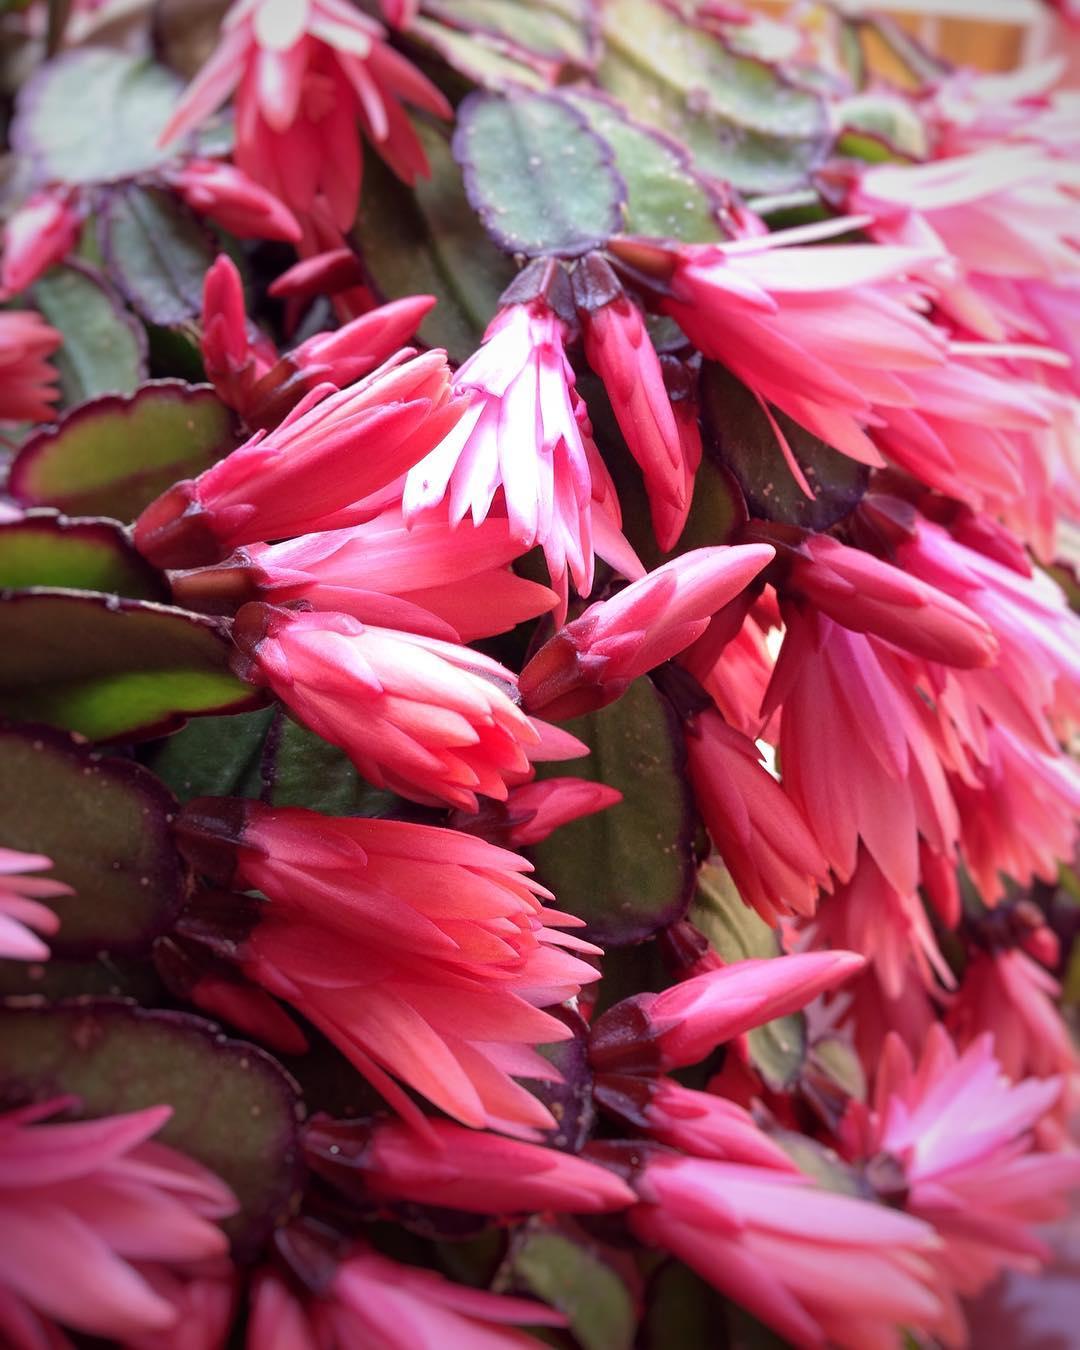 Las flores de mi balcón - Las Flores De Mi Balcón